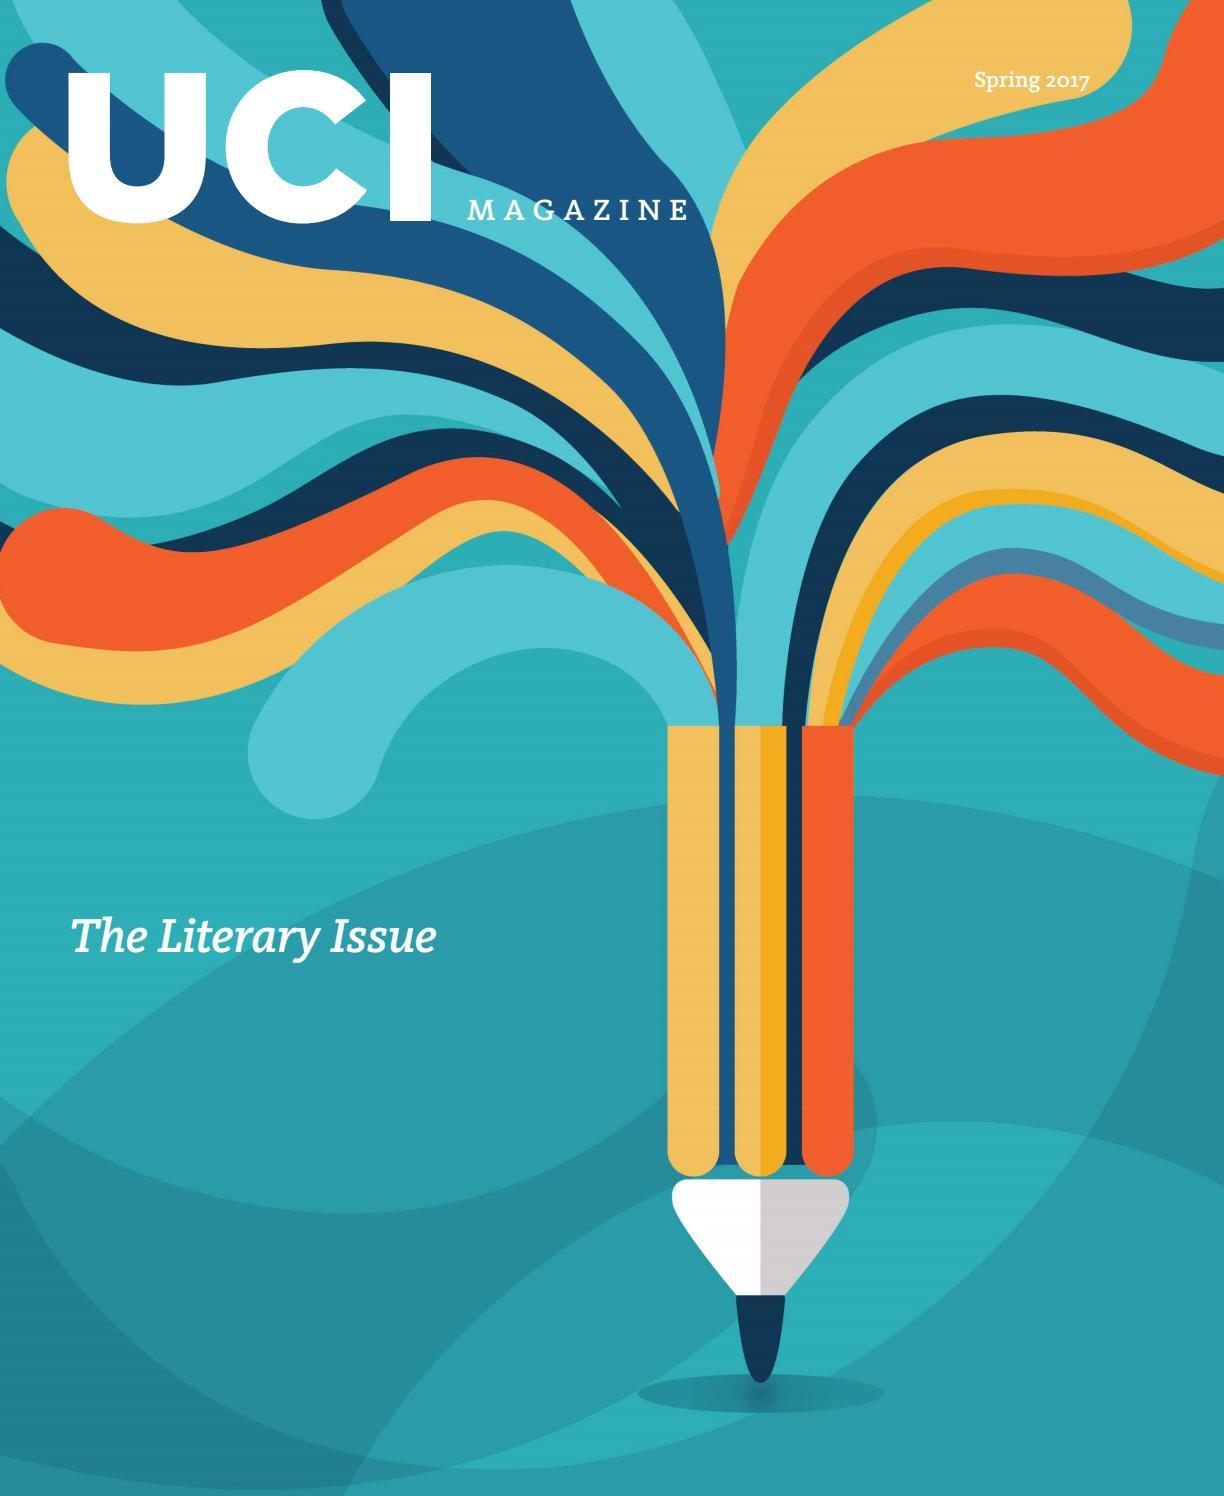 The Literary Issue, Spring 2017 UCI Magazine by UCI Magazine